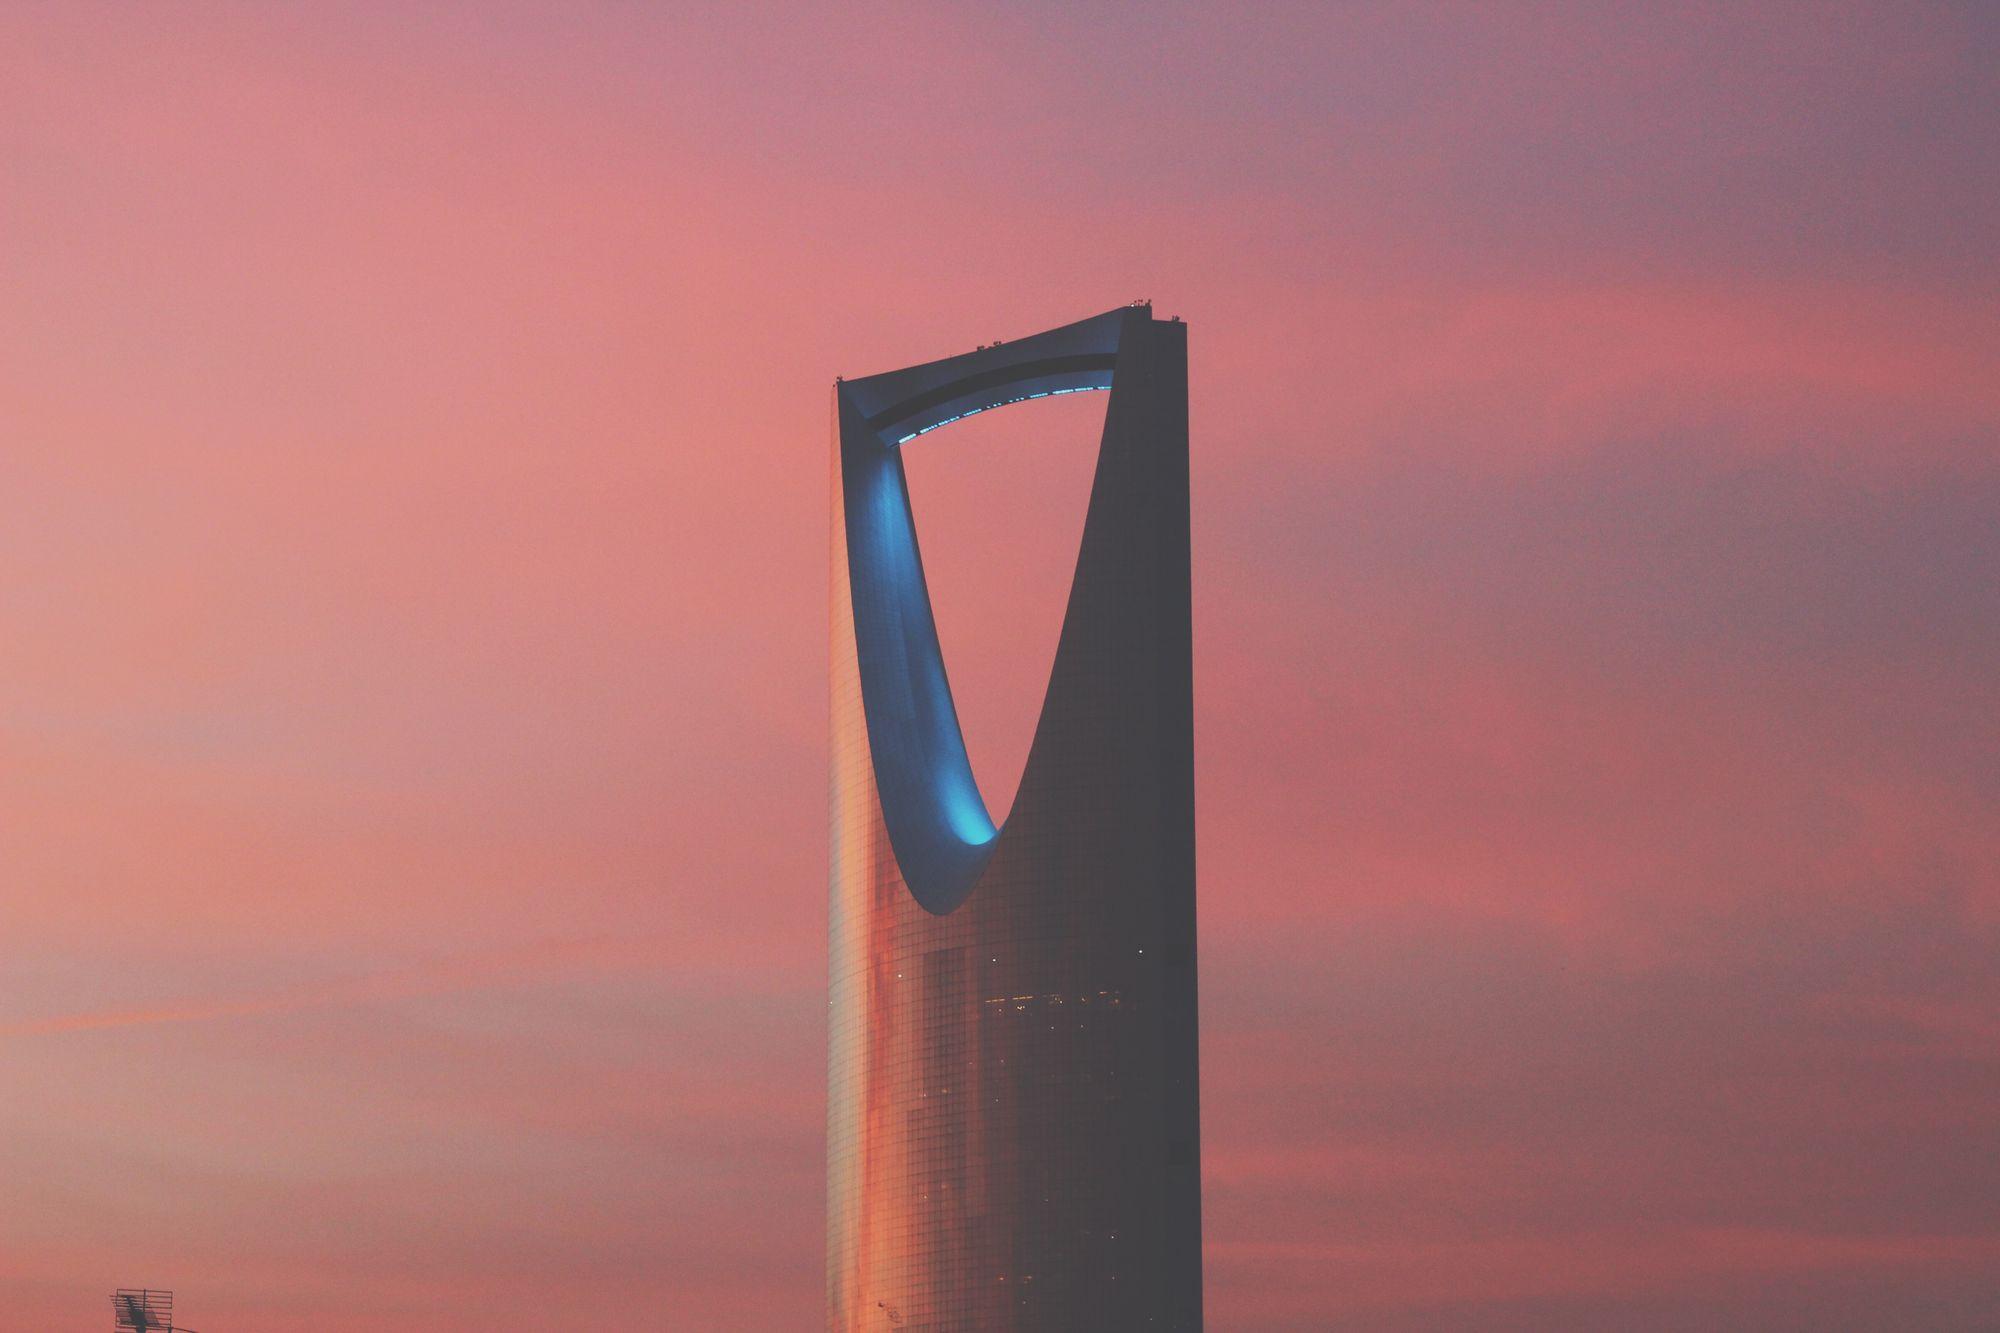 Building the New Arab Kingdom